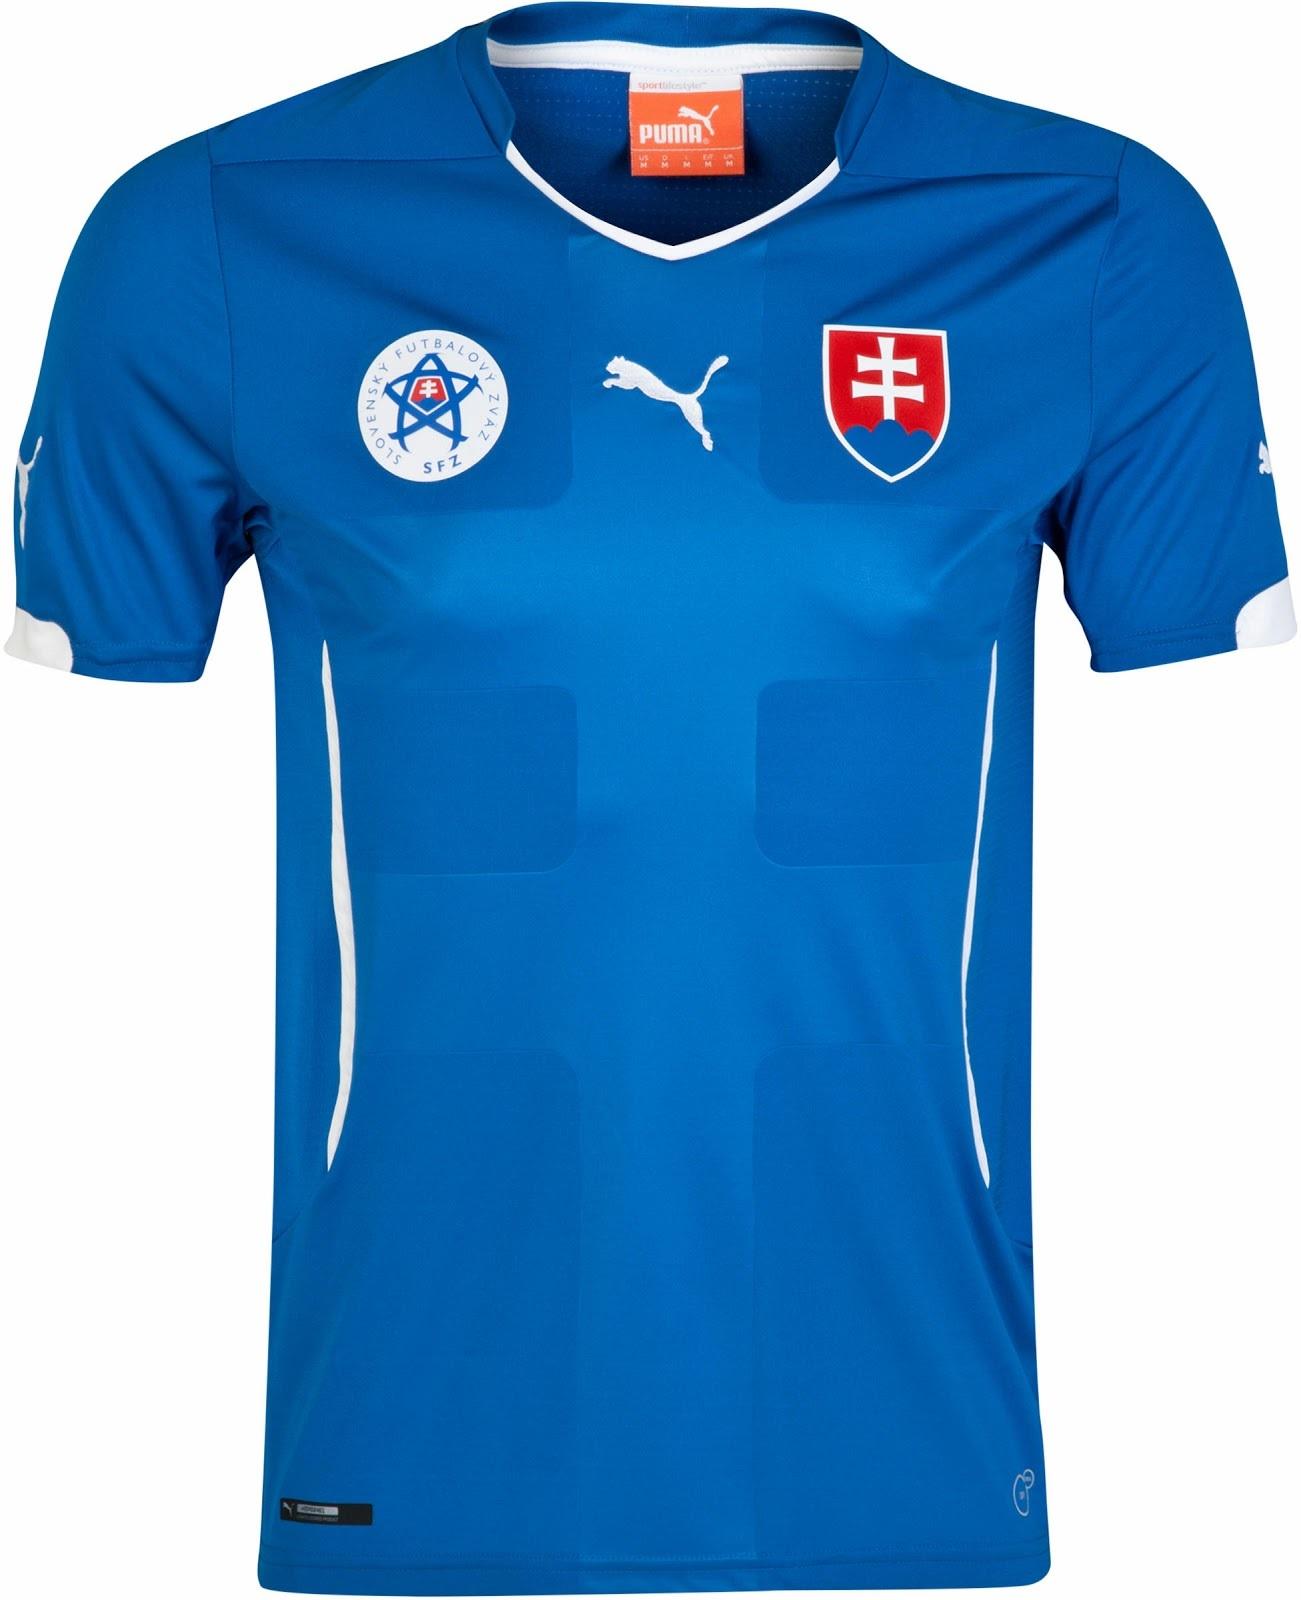 Slovakia-2014-PUMA-new-away-kit-1.jpg